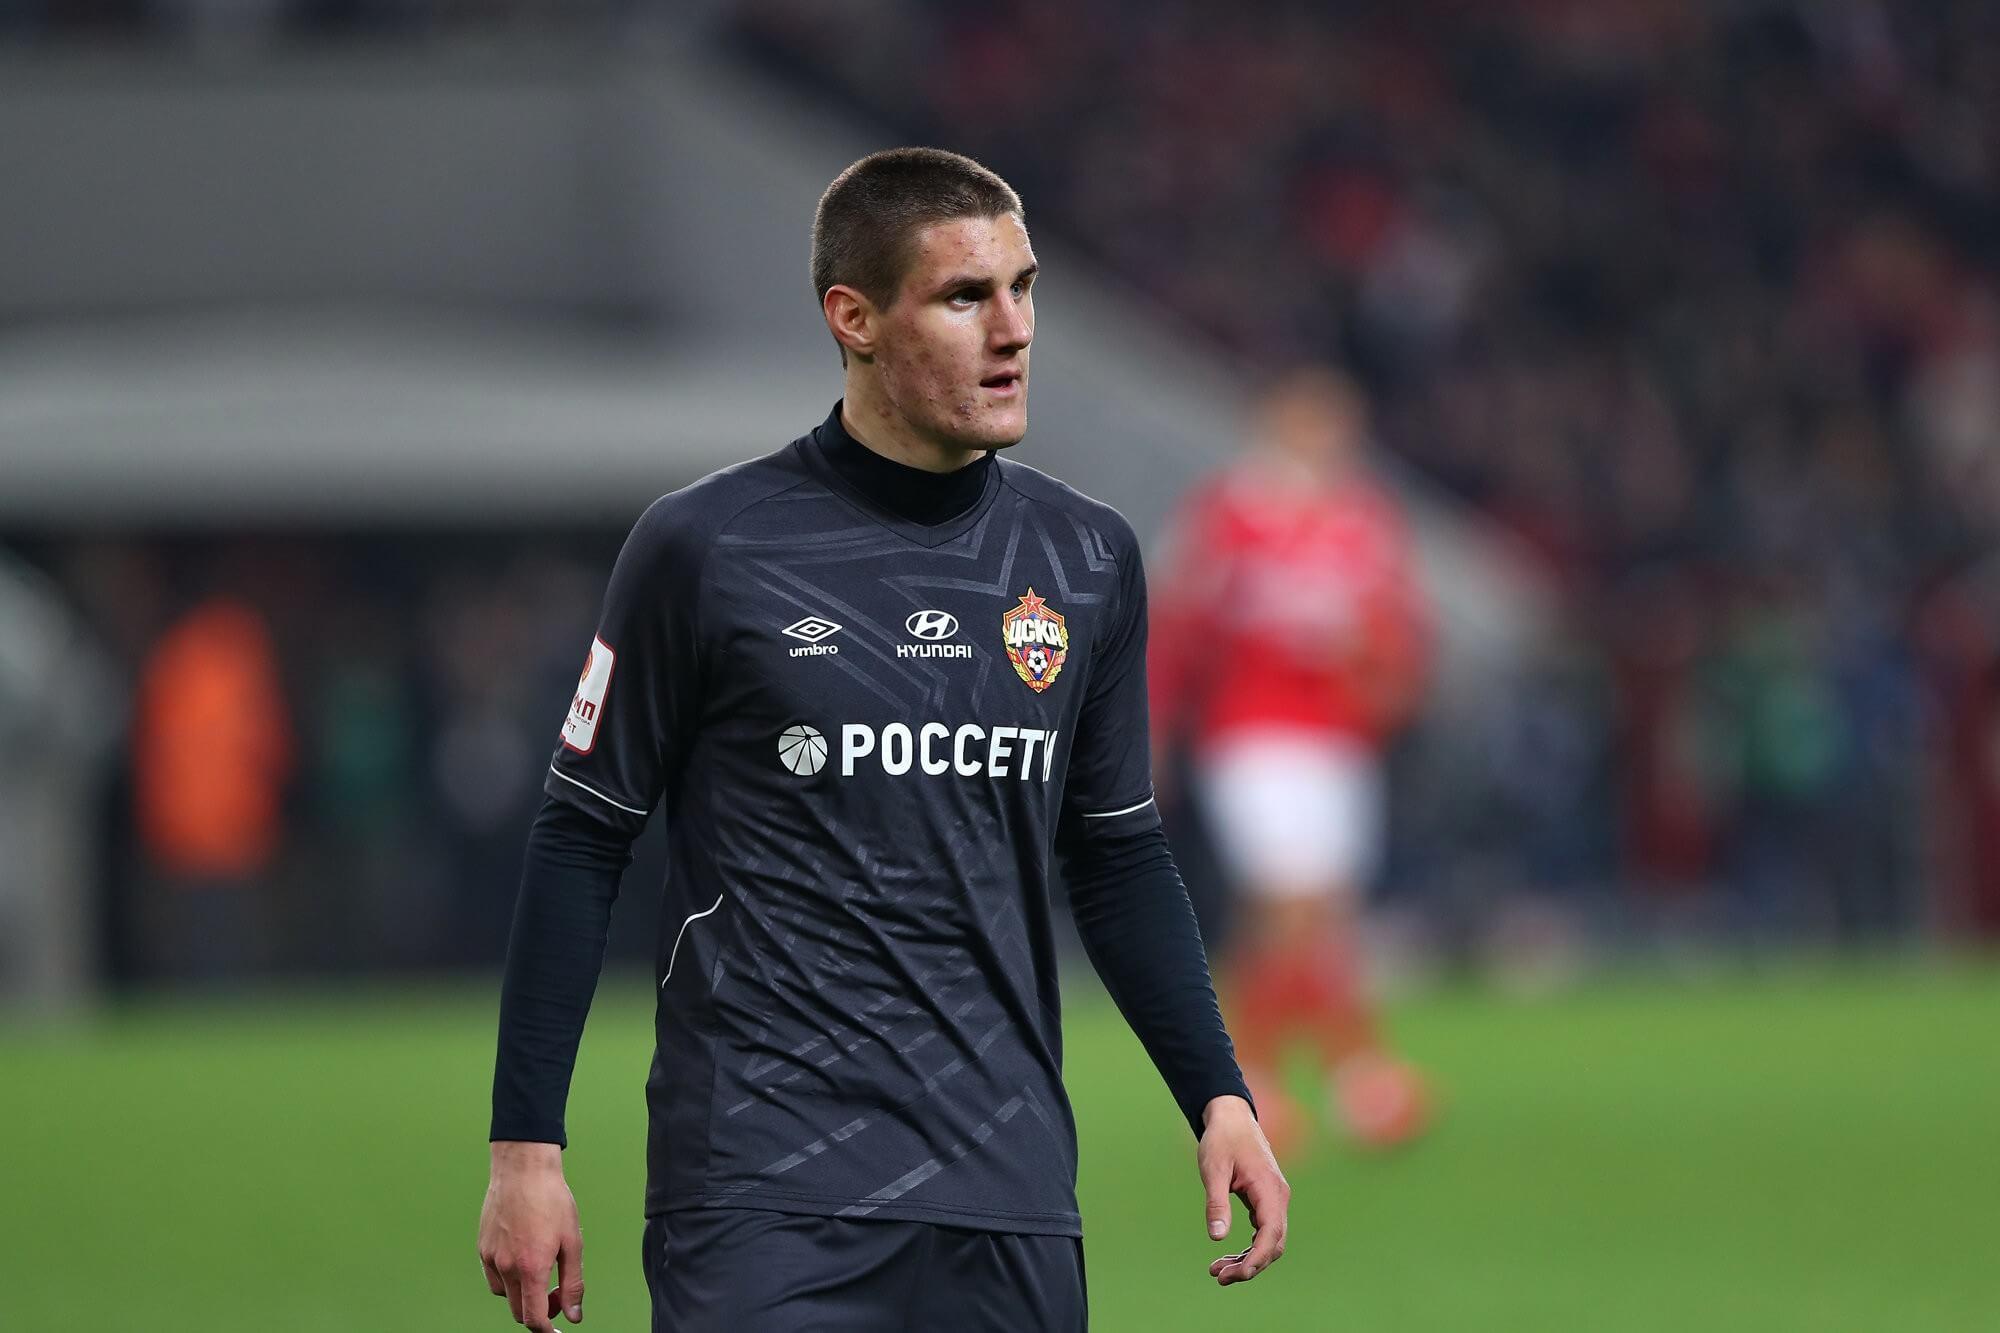 Шкурина может перейти в ЦСКА на правах аренды